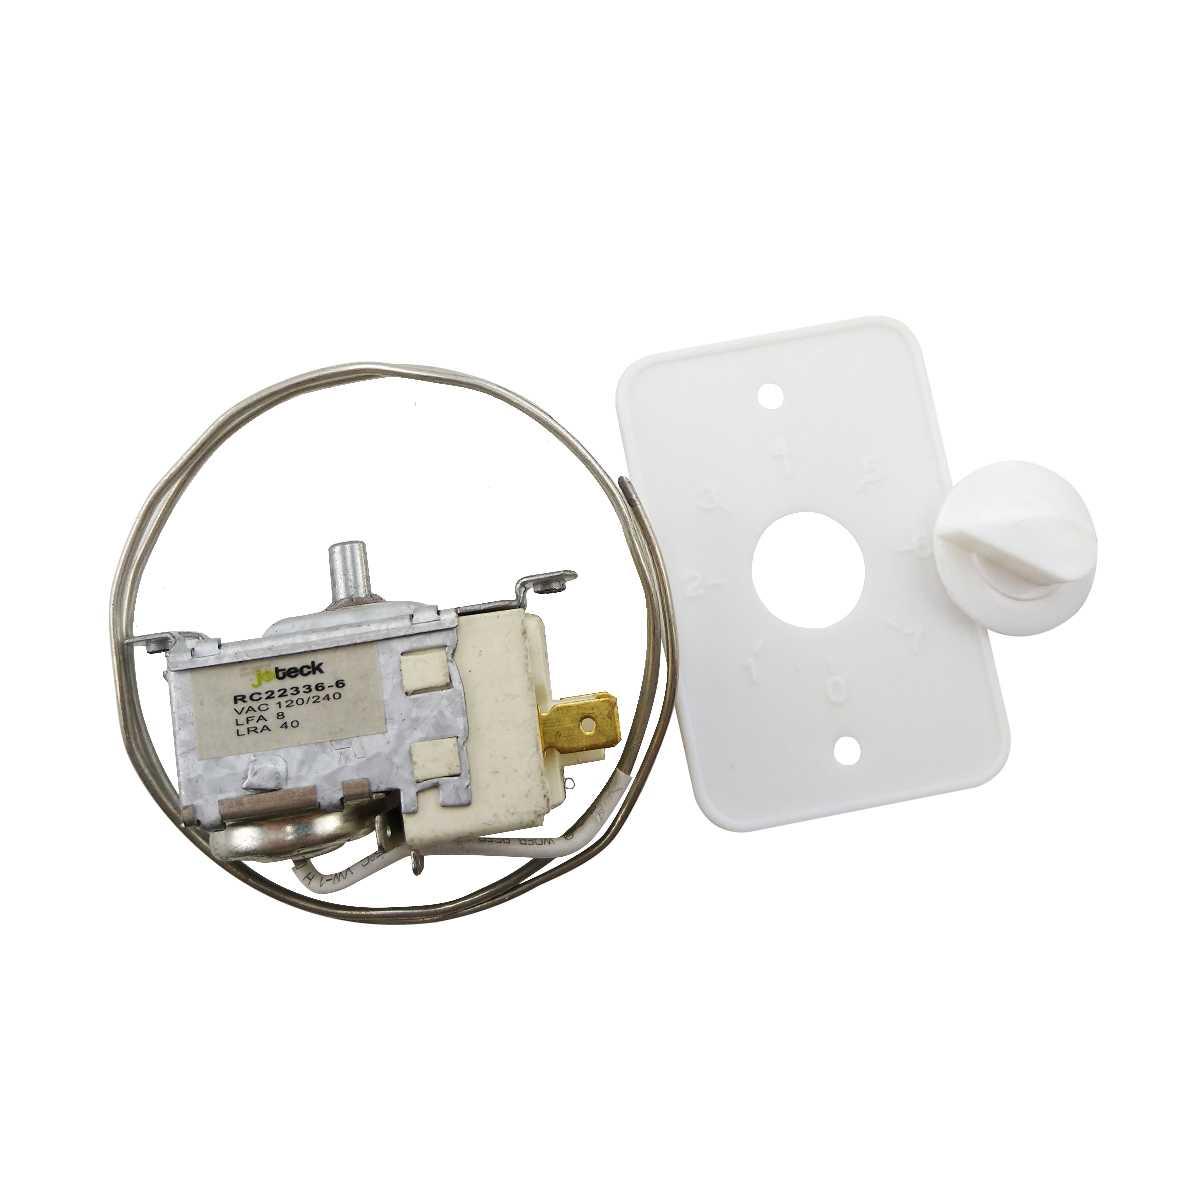 Termostato geladeira CCE C35 RC22336-6P